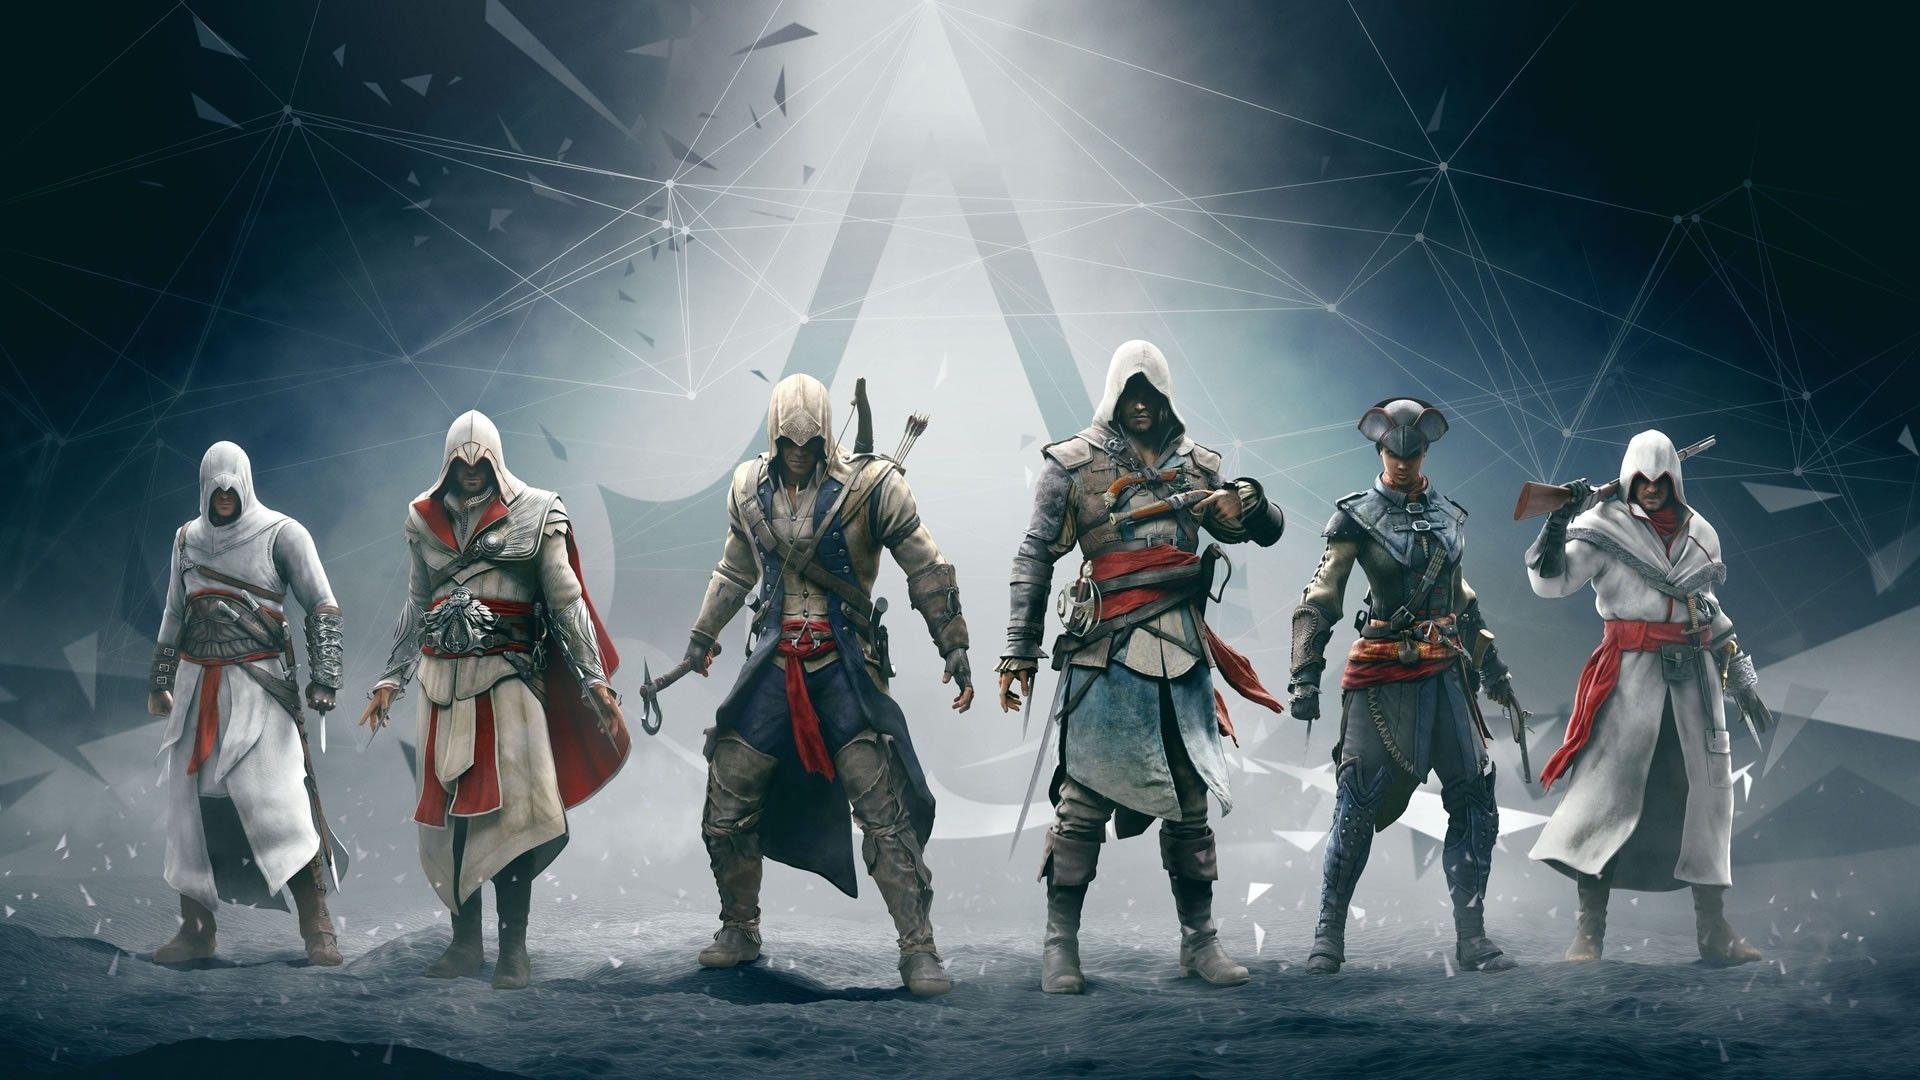 Assassin'-s Creed - Crossover: Connor vs Ezio by josetemg on DeviantArt